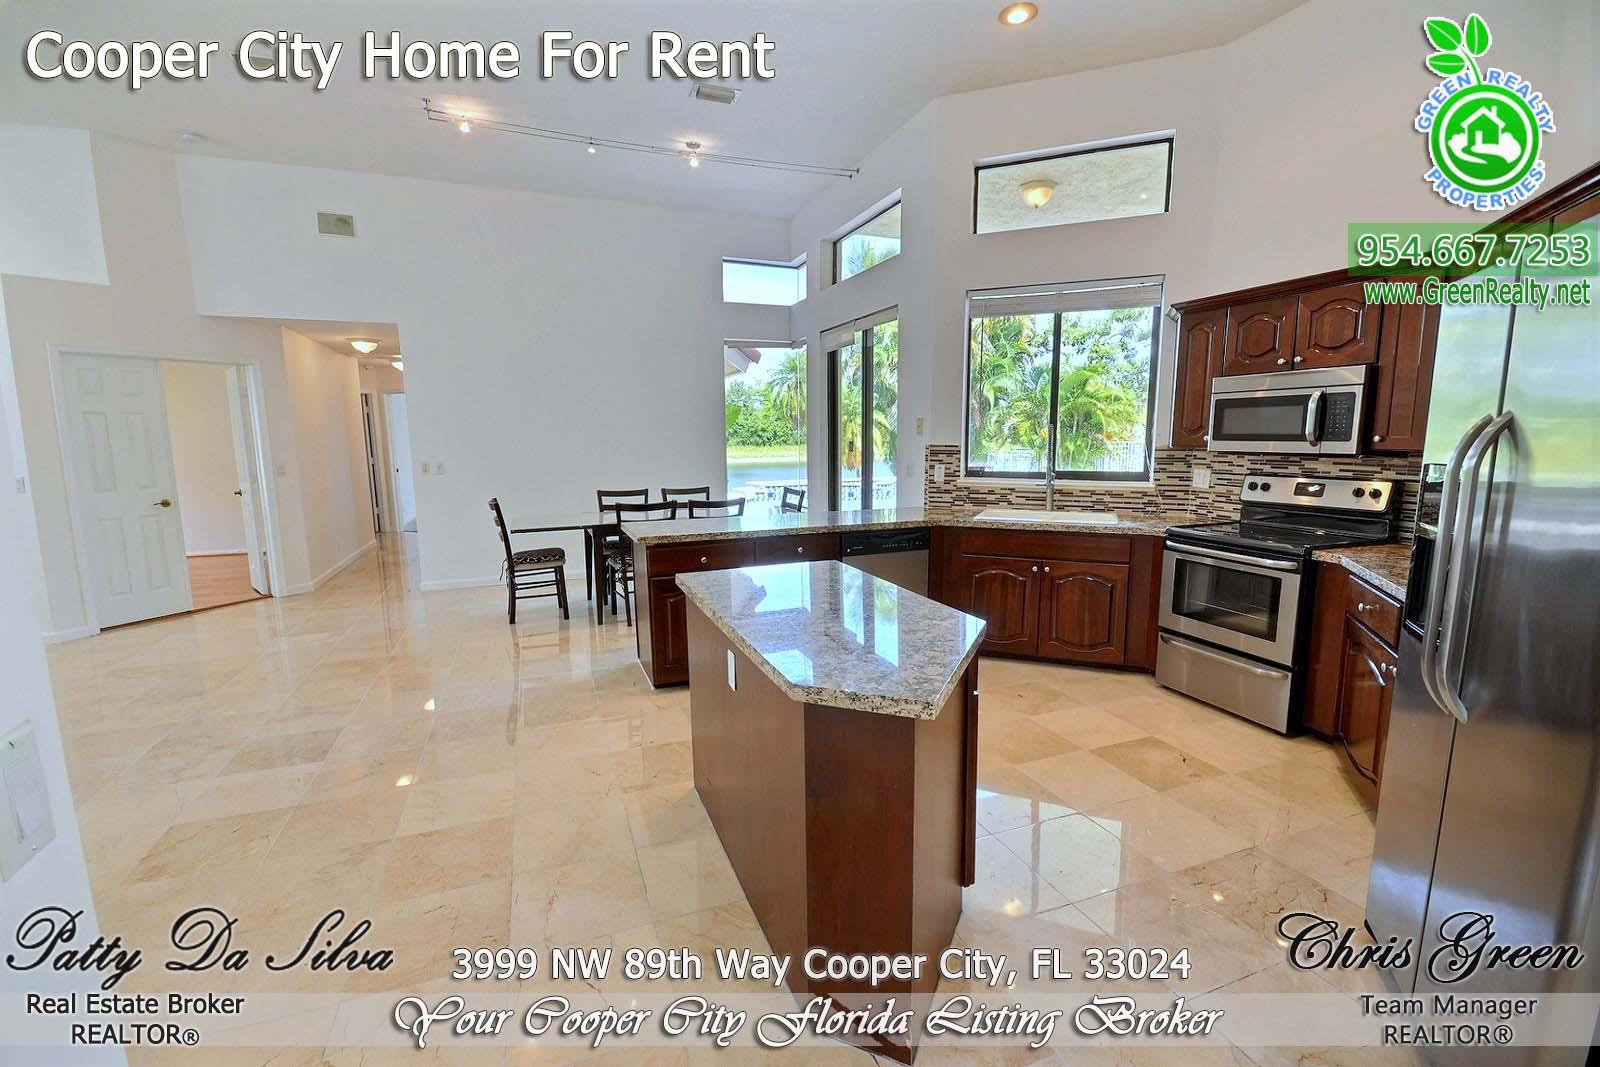 18 Cooper City Home Rentals (3)